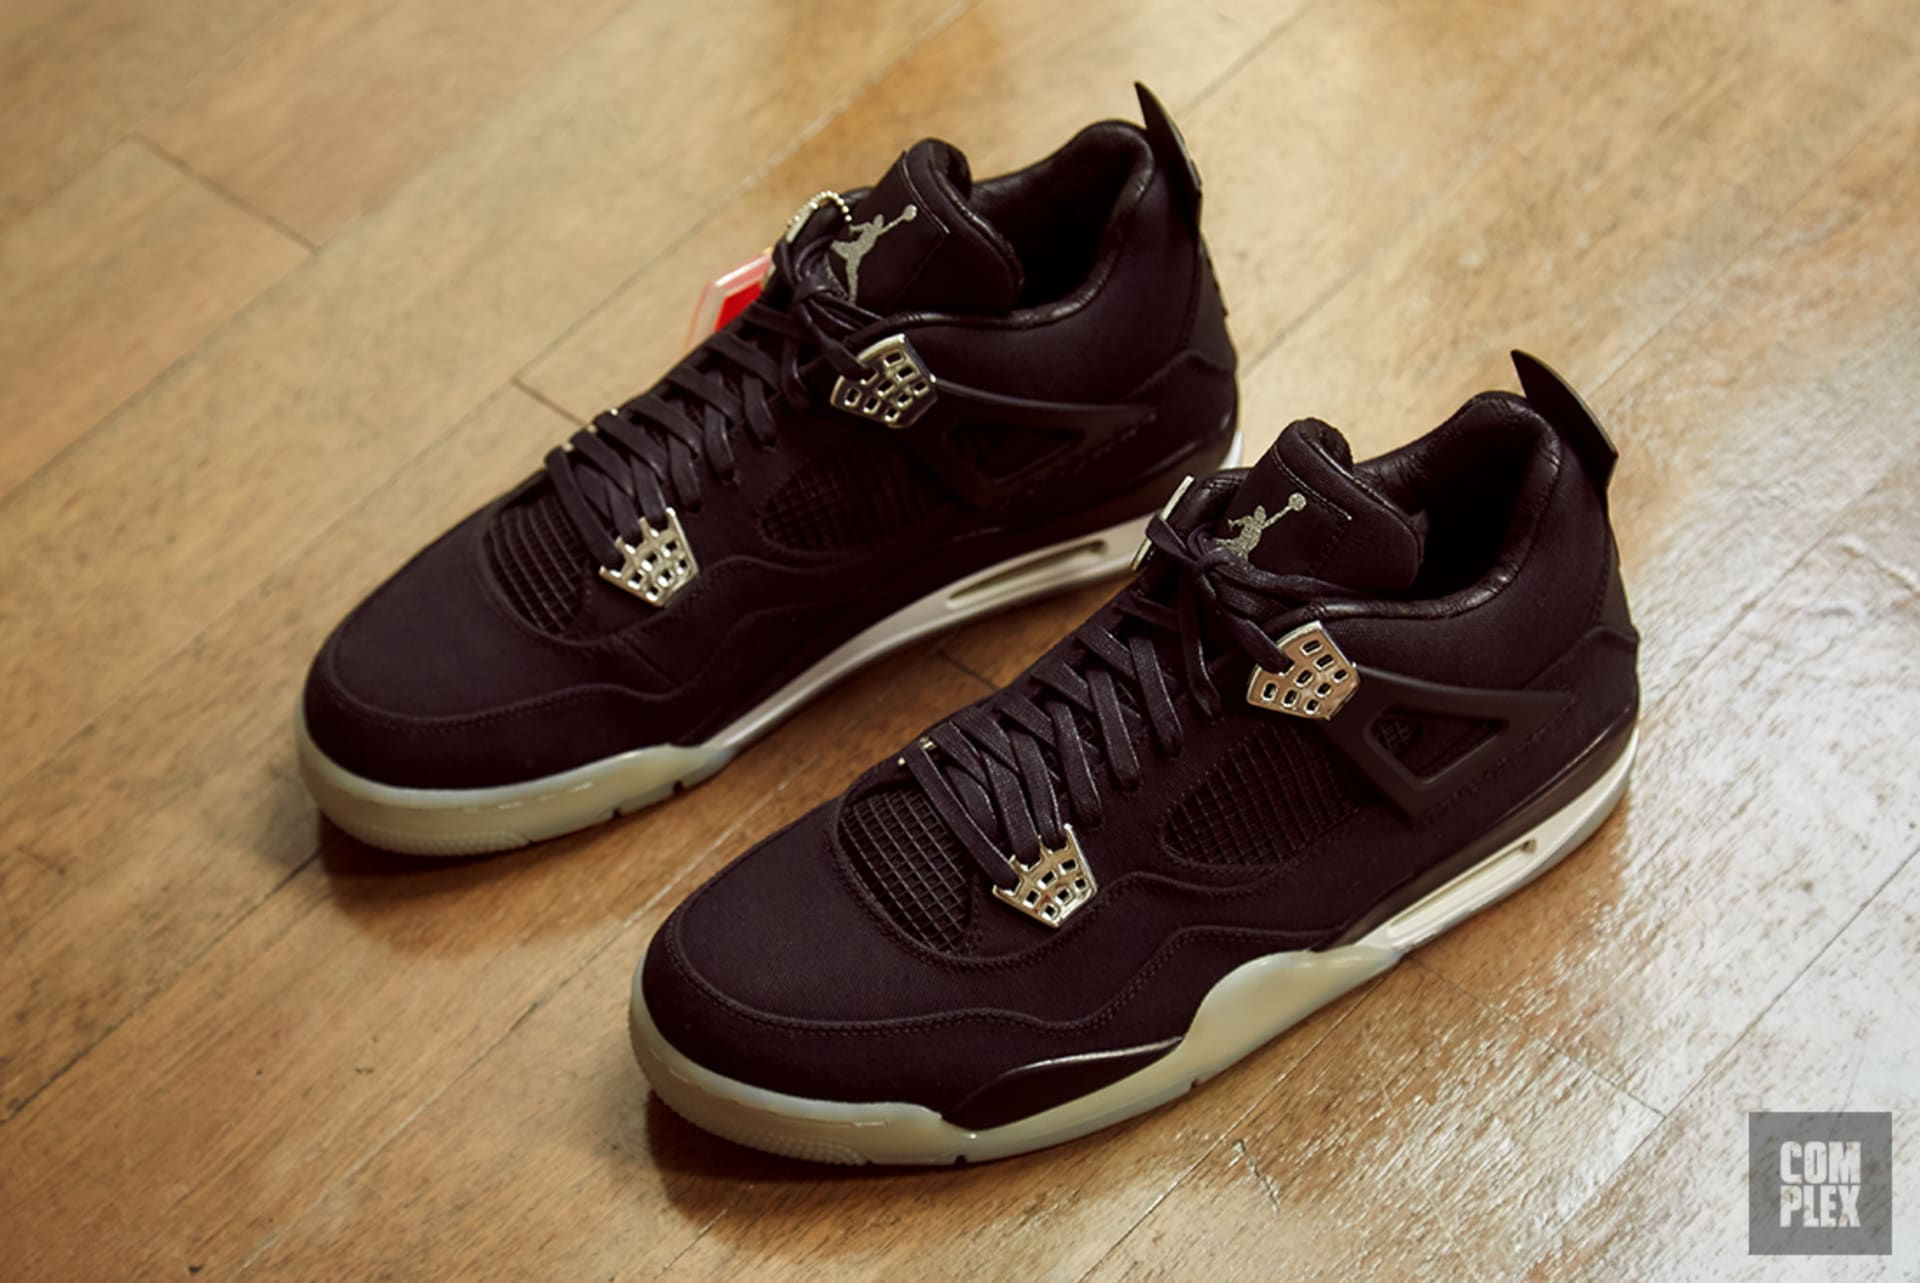 check out 317cd f0338 Eminem Air Jordan 4 Carhartt